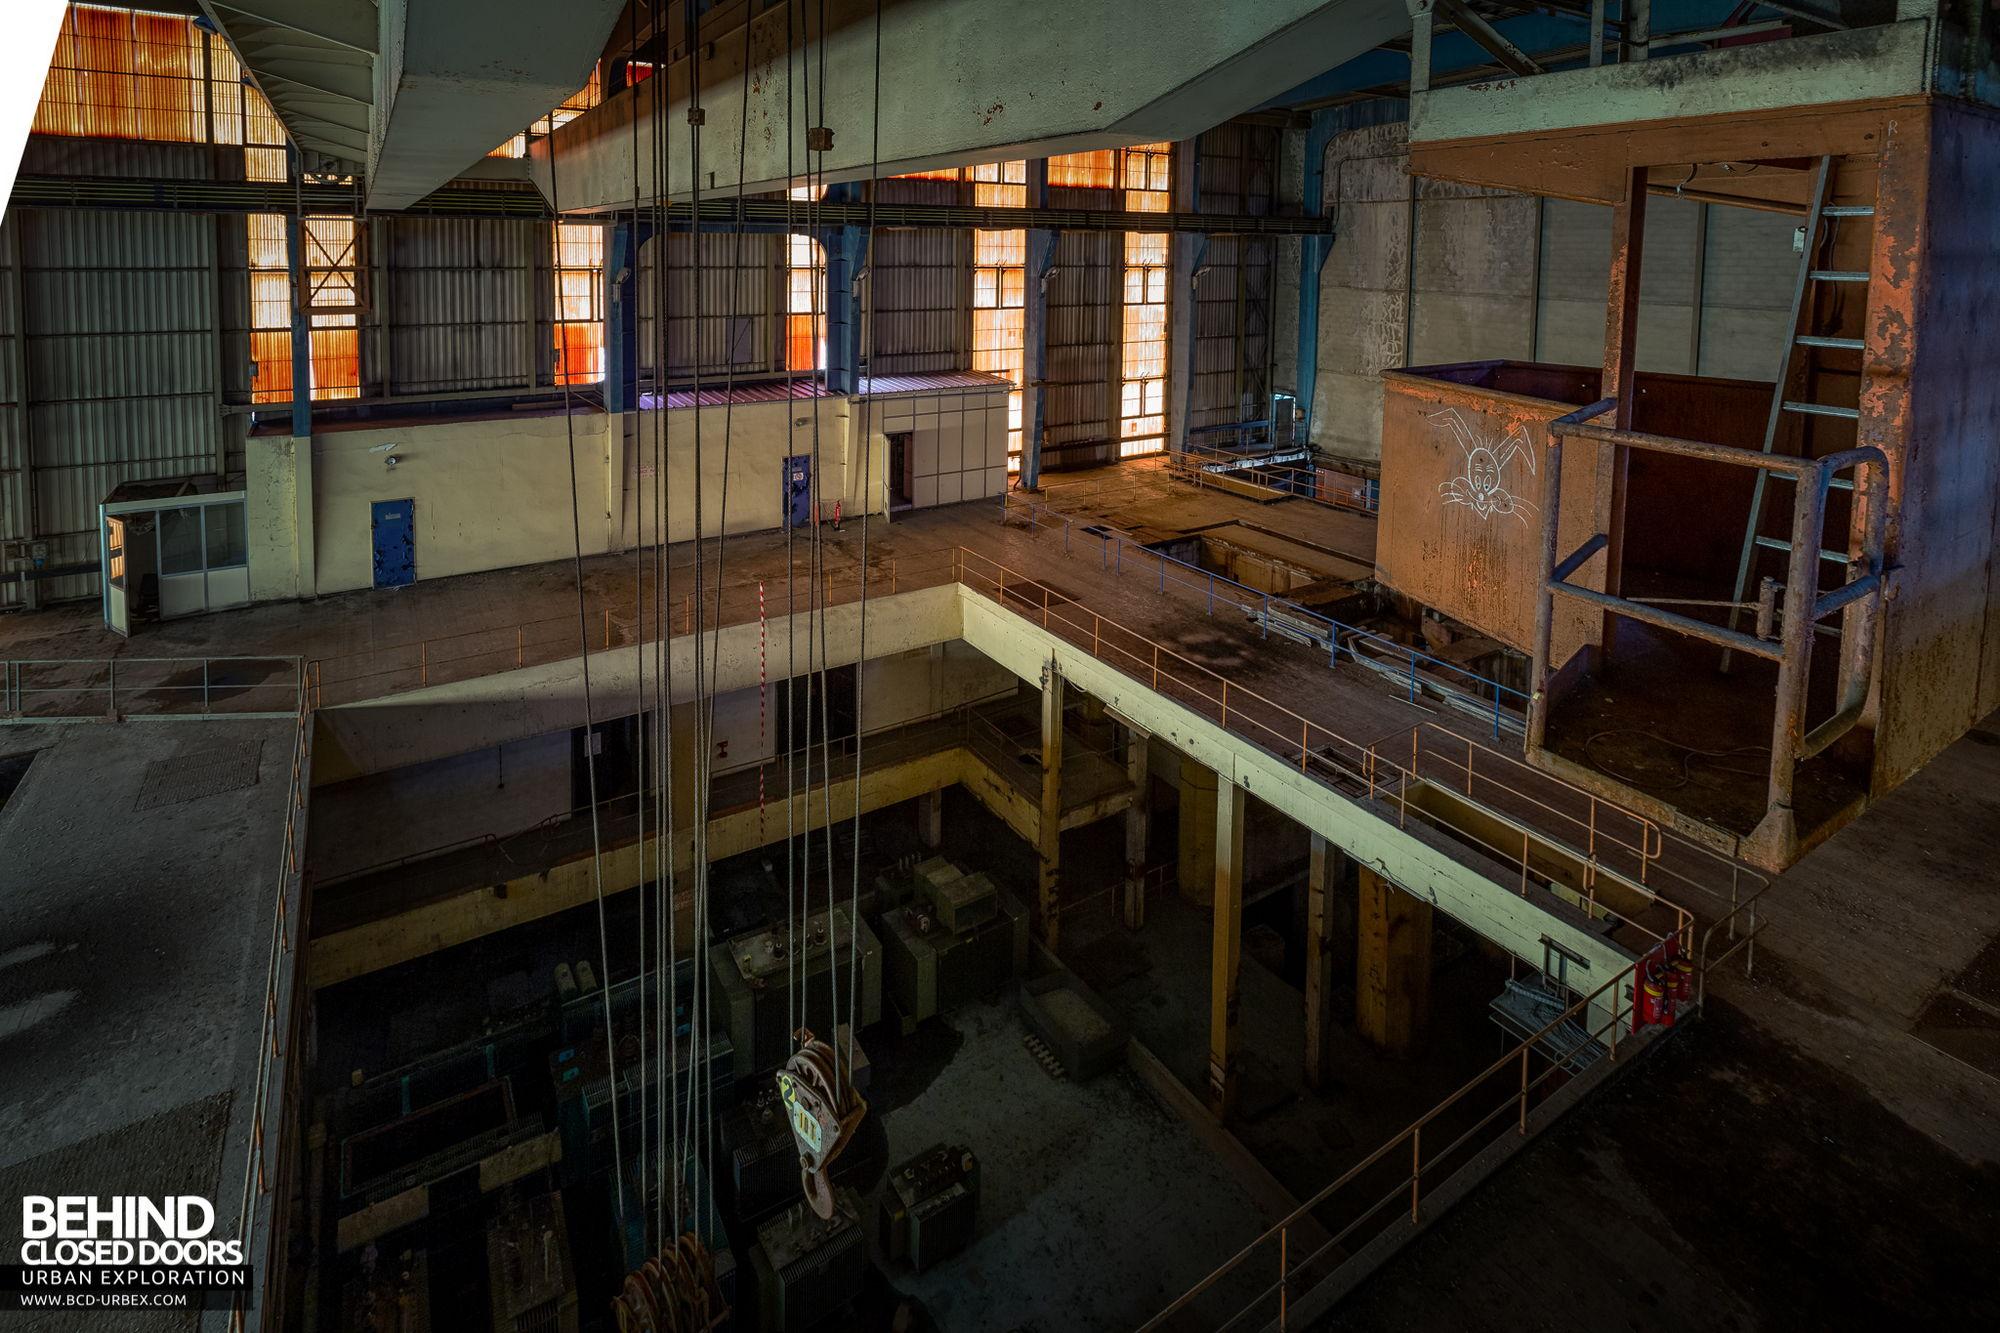 Stora Enso, Corbehem - Turbine hall - the turbines had been removed